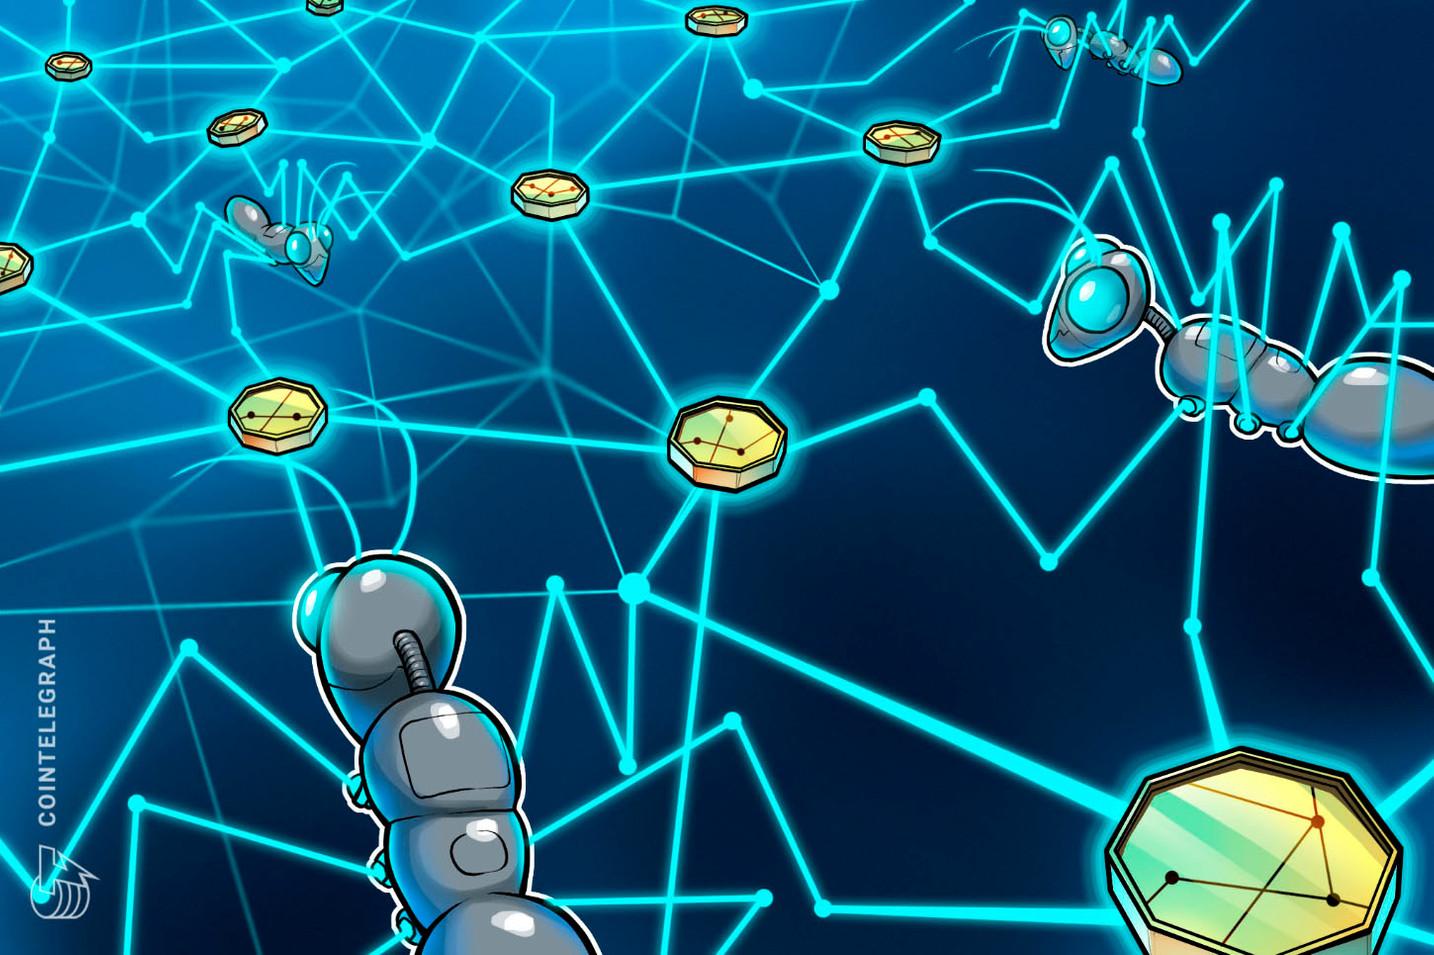 Crypto.com distribuerar sitt Ethereum Virtual Machine-kedjan testnet